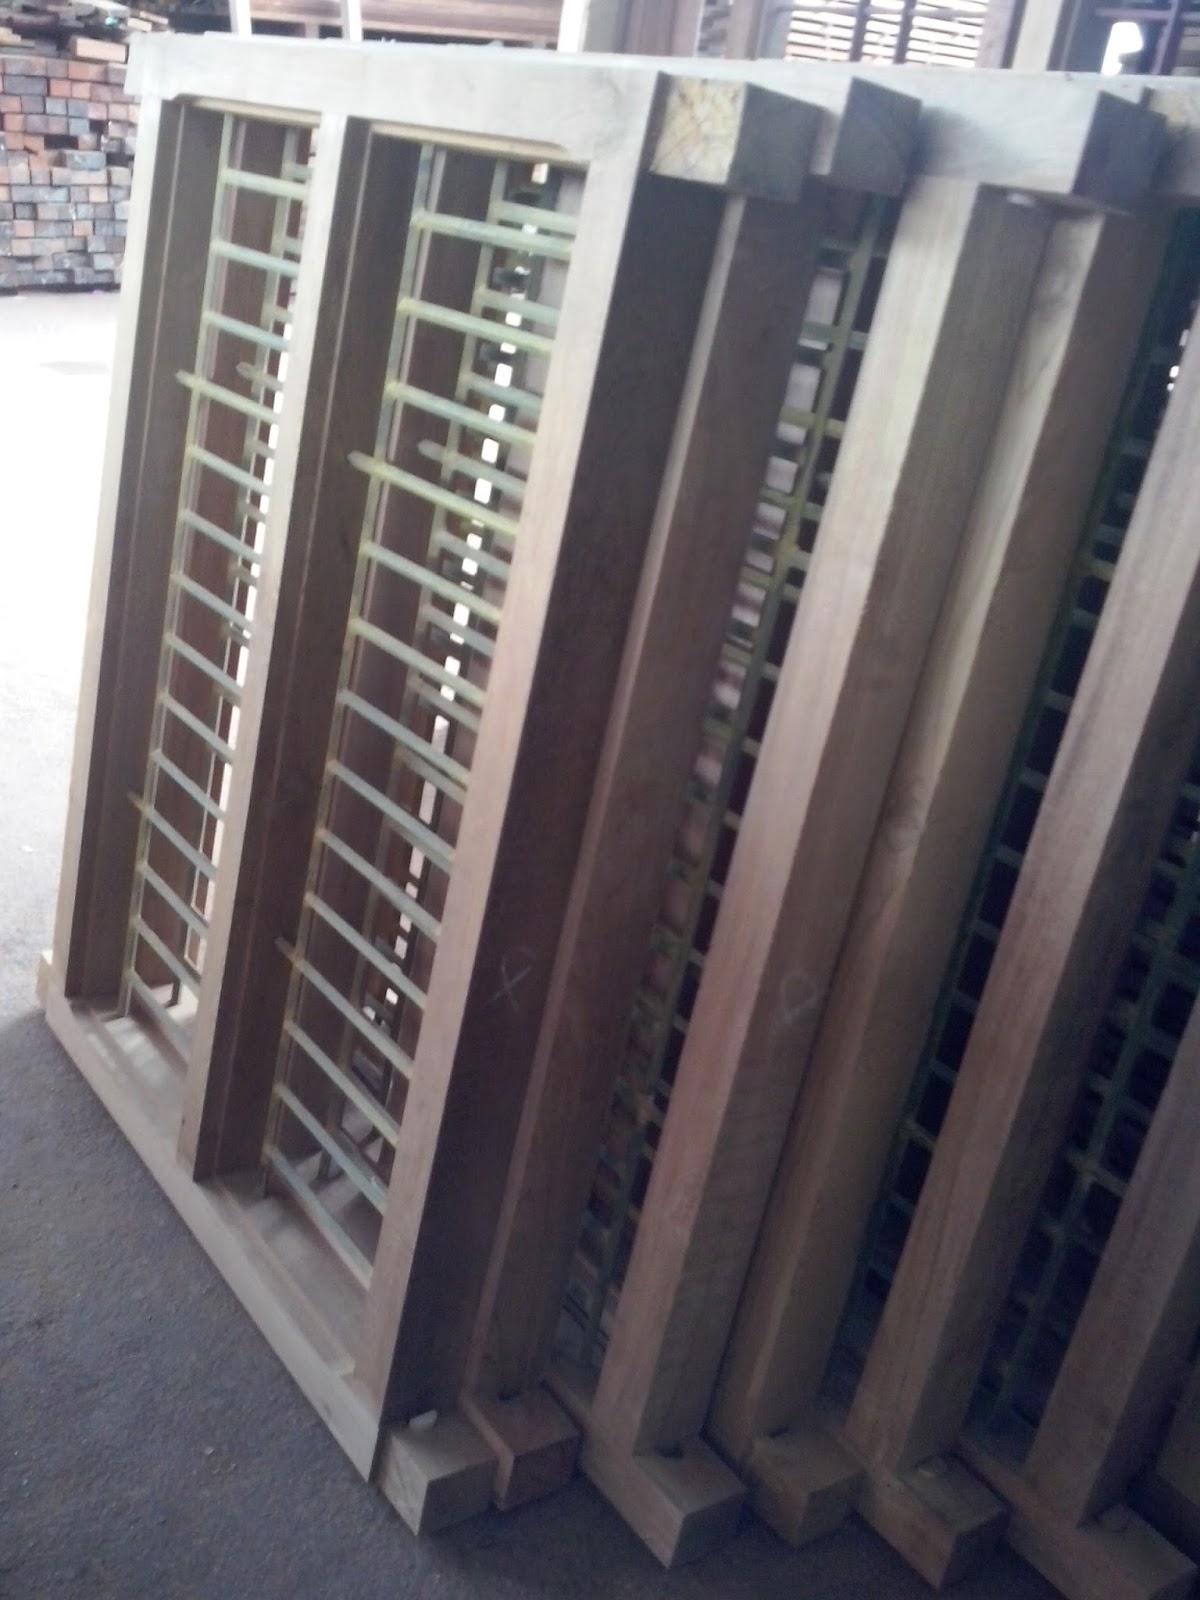 Bavas Wood Works Pooja Room Door Frame And Door Designs: Carpenter Work Ideas And Kerala Style Wooden Decor: Kerala